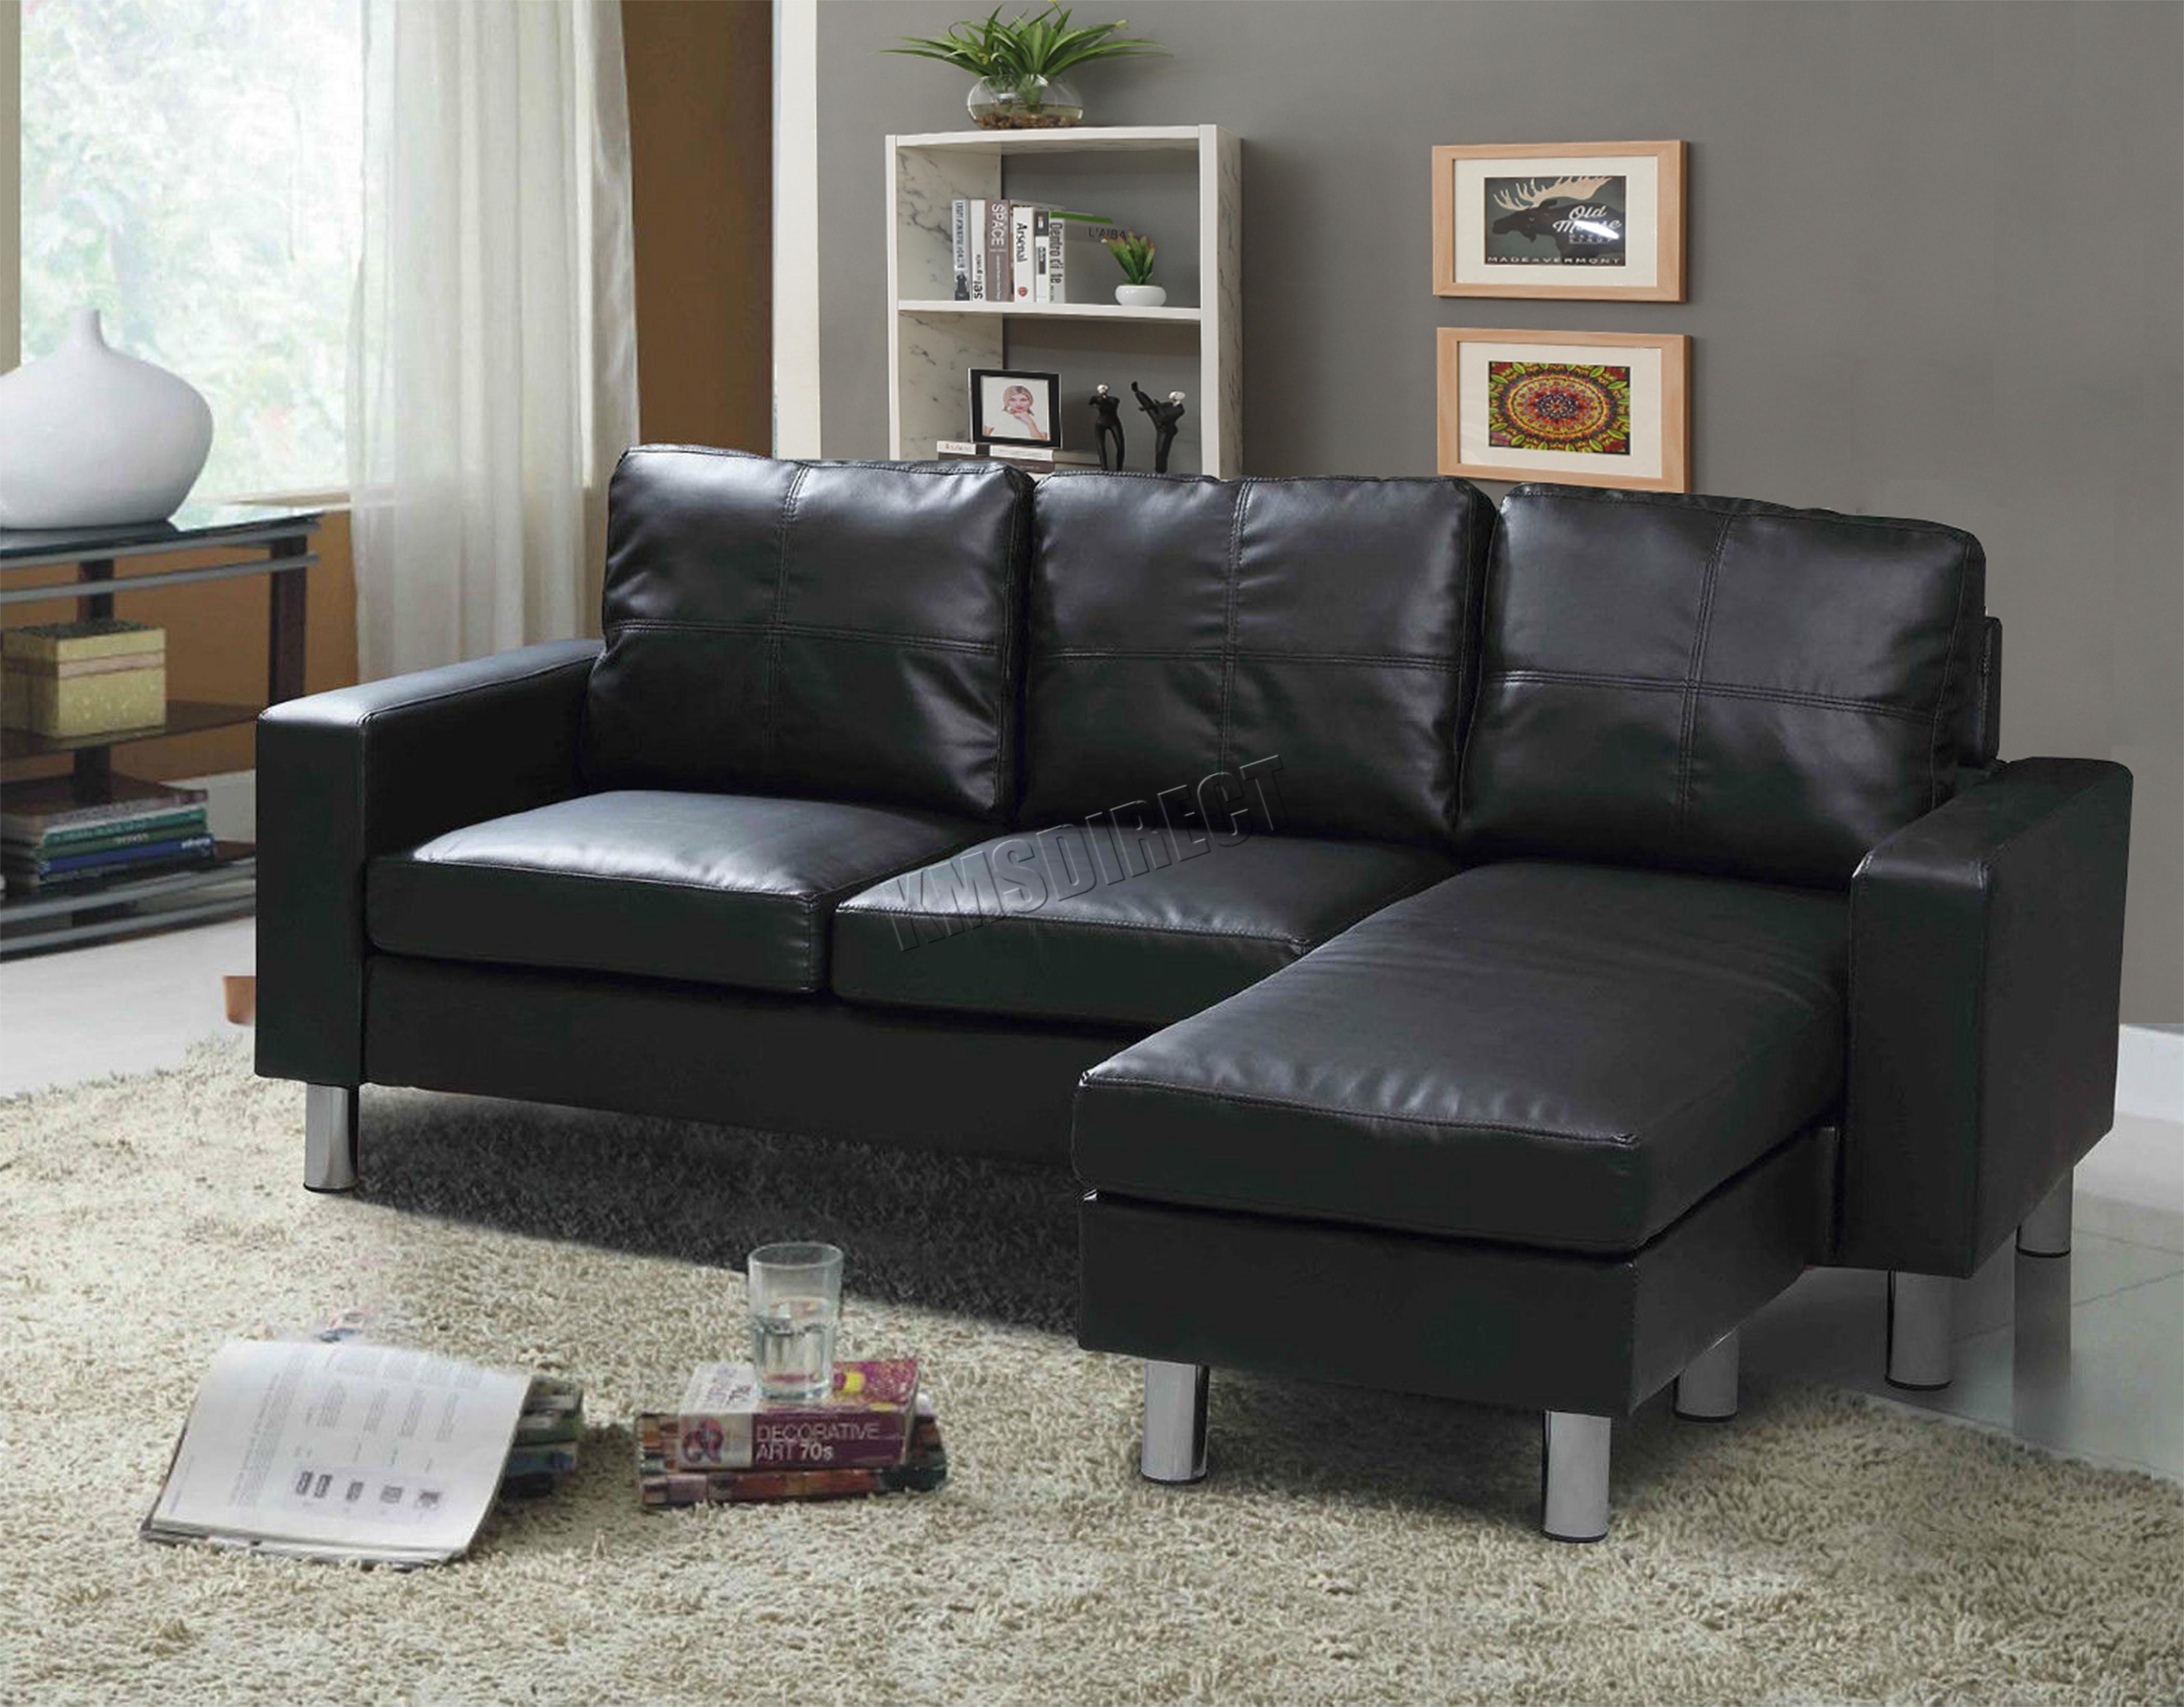 black sofa chaise longue inexpensive modern sleeper foxhunter pu l shaped corner 3 seater with